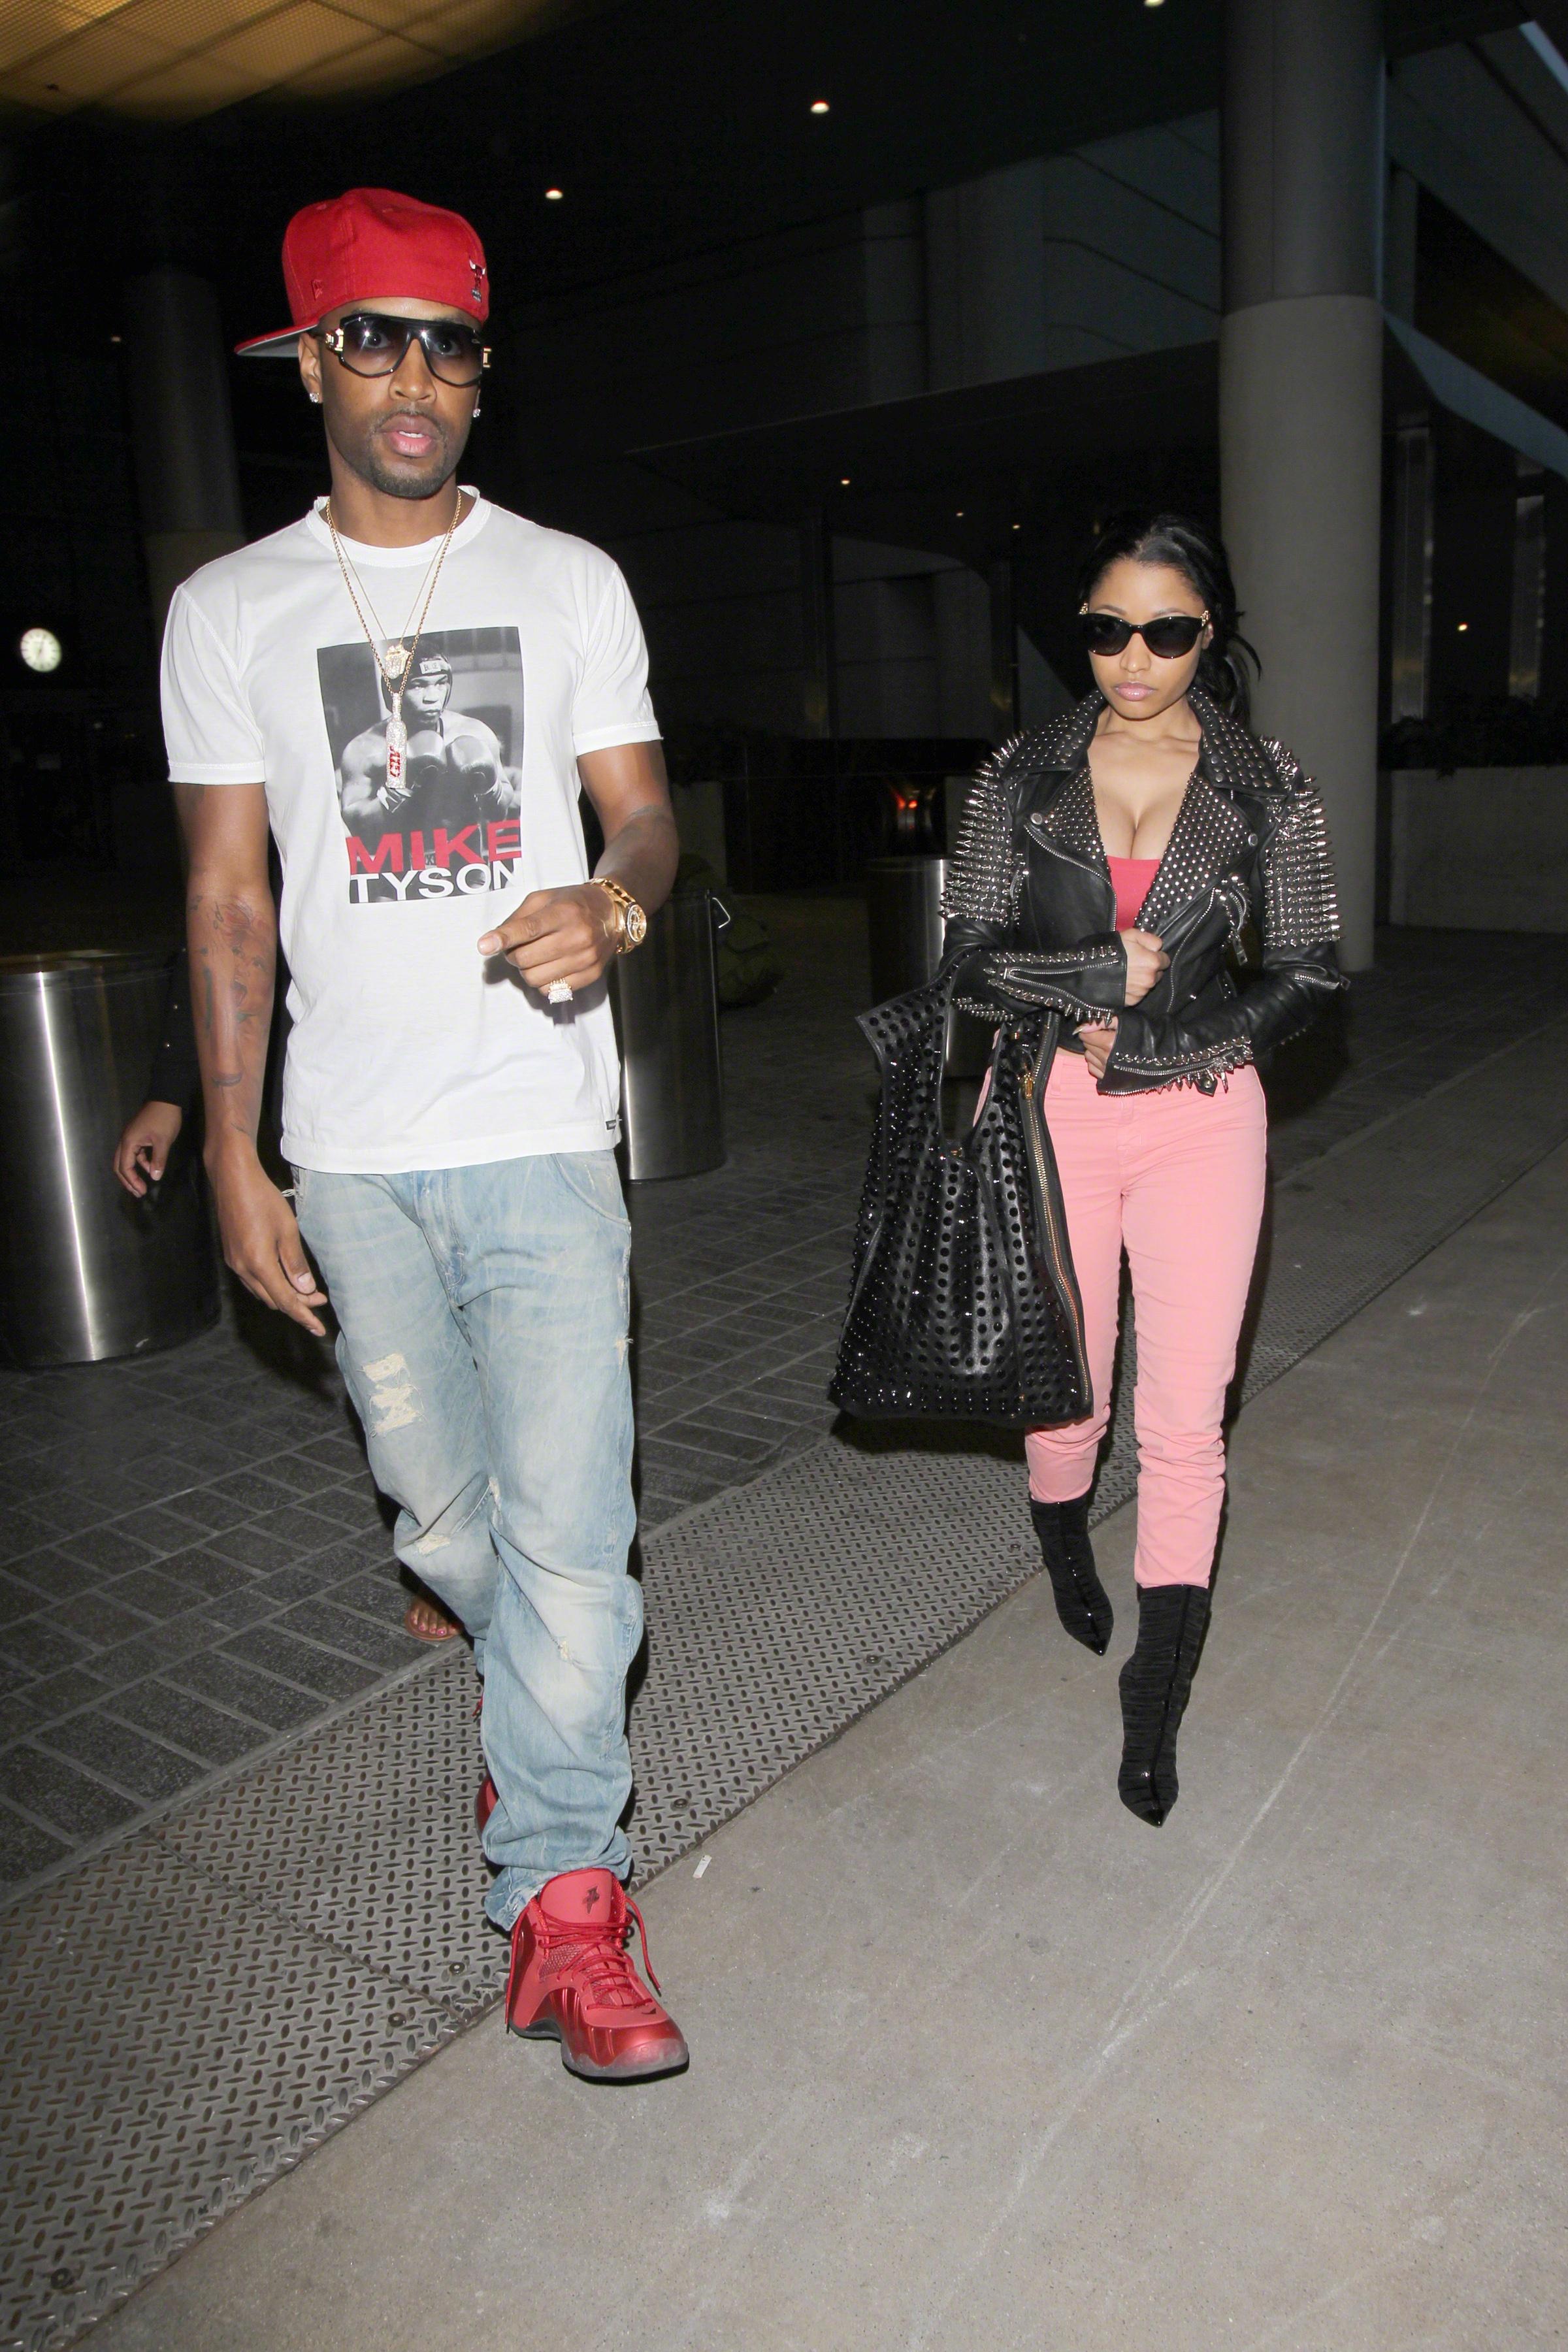 Nicki Minaj and Safaree Samuels